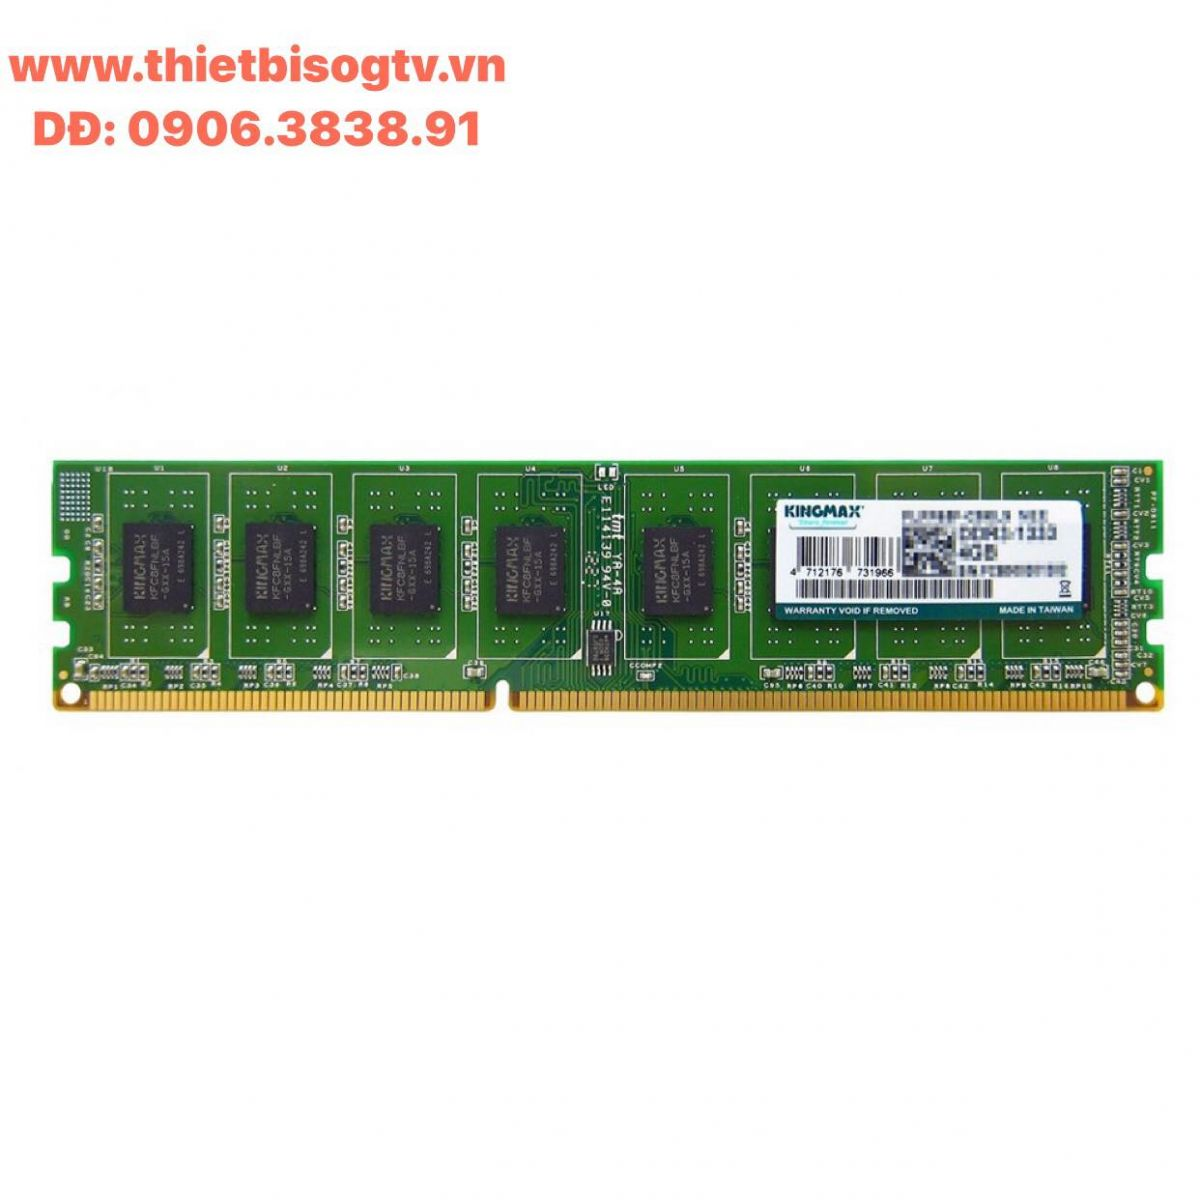 Bộ nhớ DDR3 Kingmax 4GB bus 1333